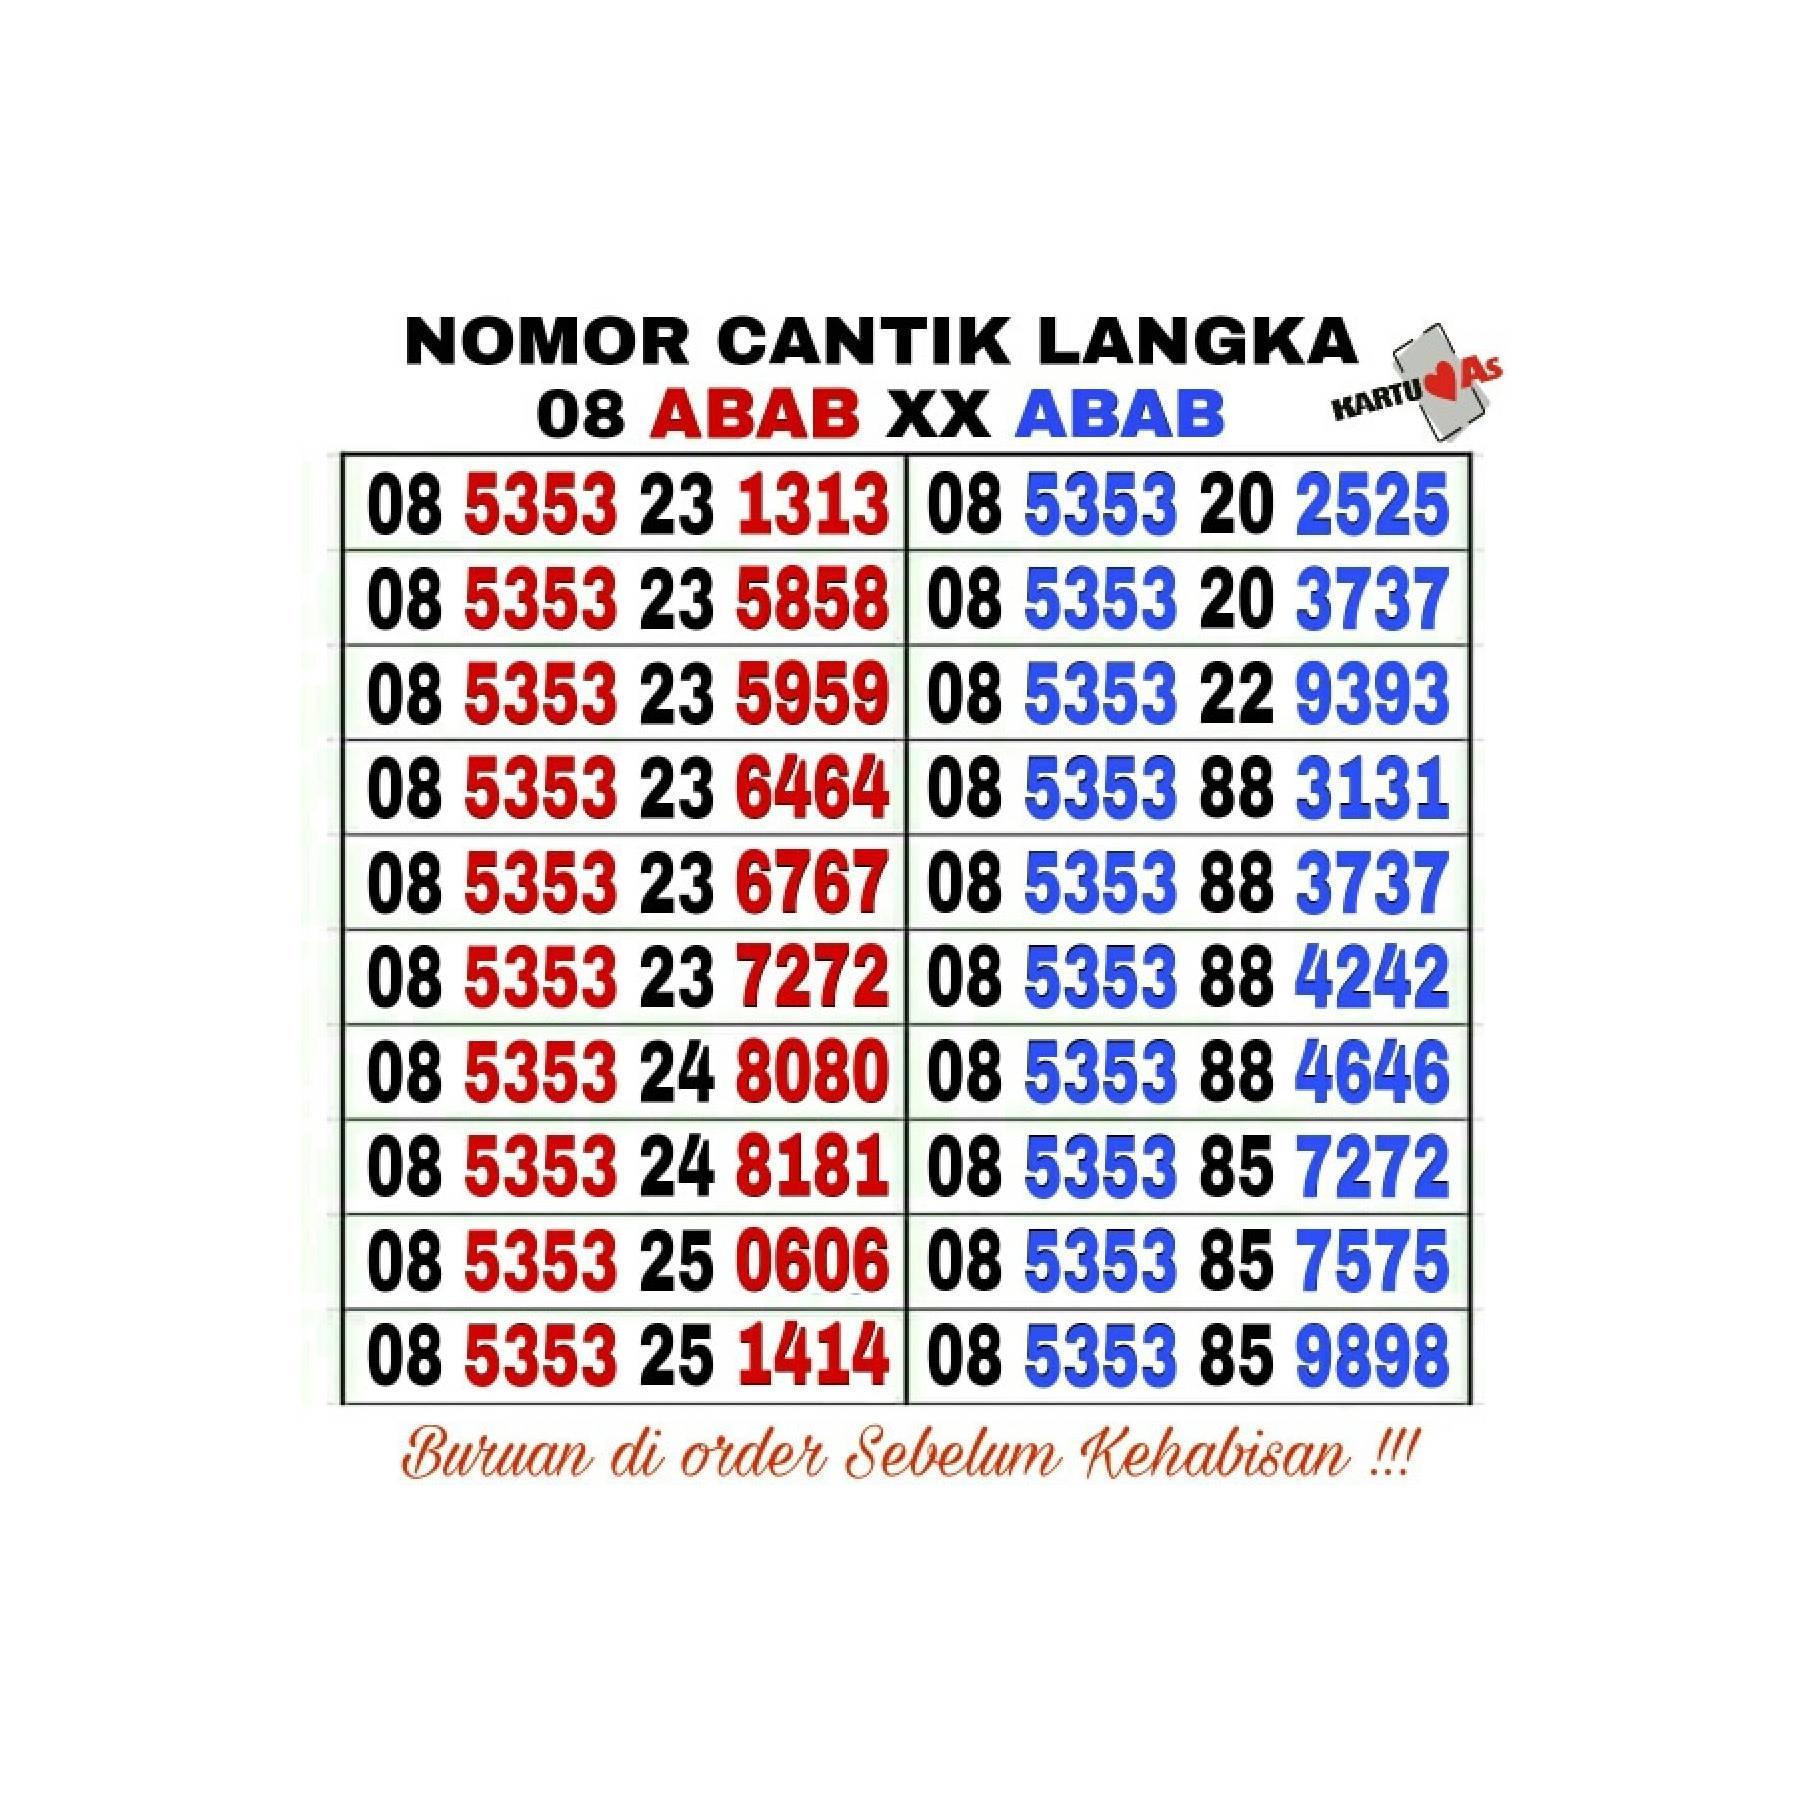 Cek Harga Baru Nomor Cantik Kartu Perdana No Telkomsel As Tsel Kuota 9gb Gambar Produk Rinci Indosat Im3 Xl Axis Terkini